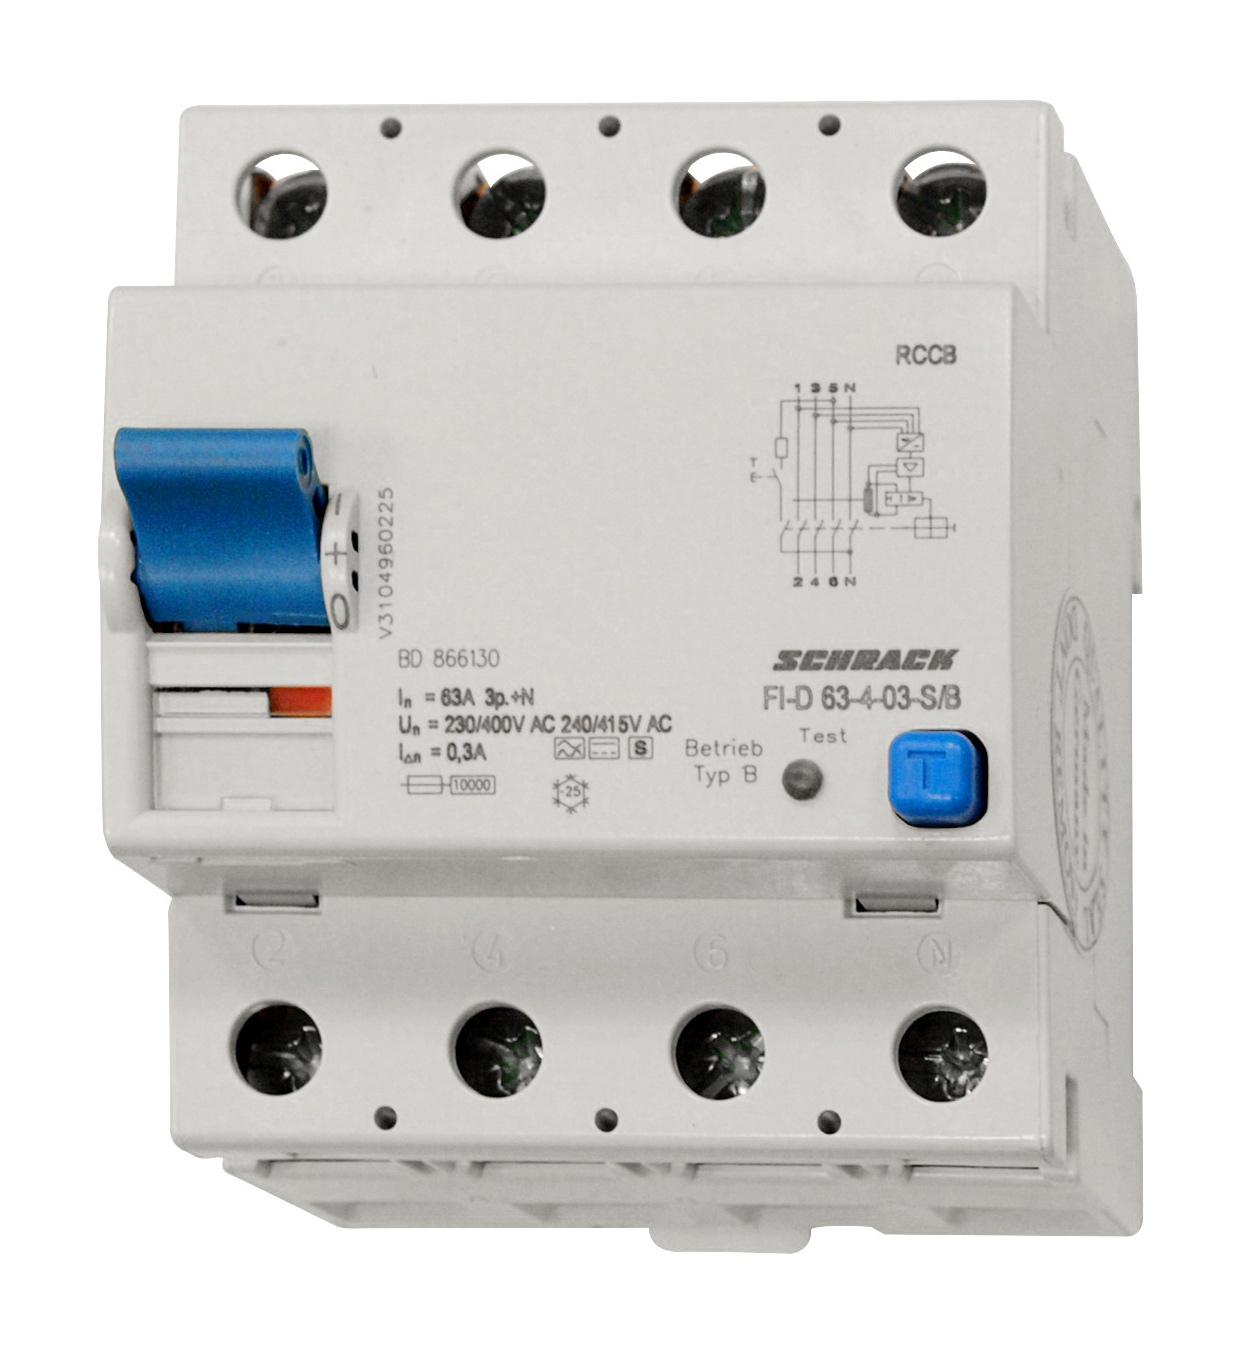 1 Stk Selektiver FI-Schalter 63A, 4-polig, 300mA, Typ Bs BD866130--